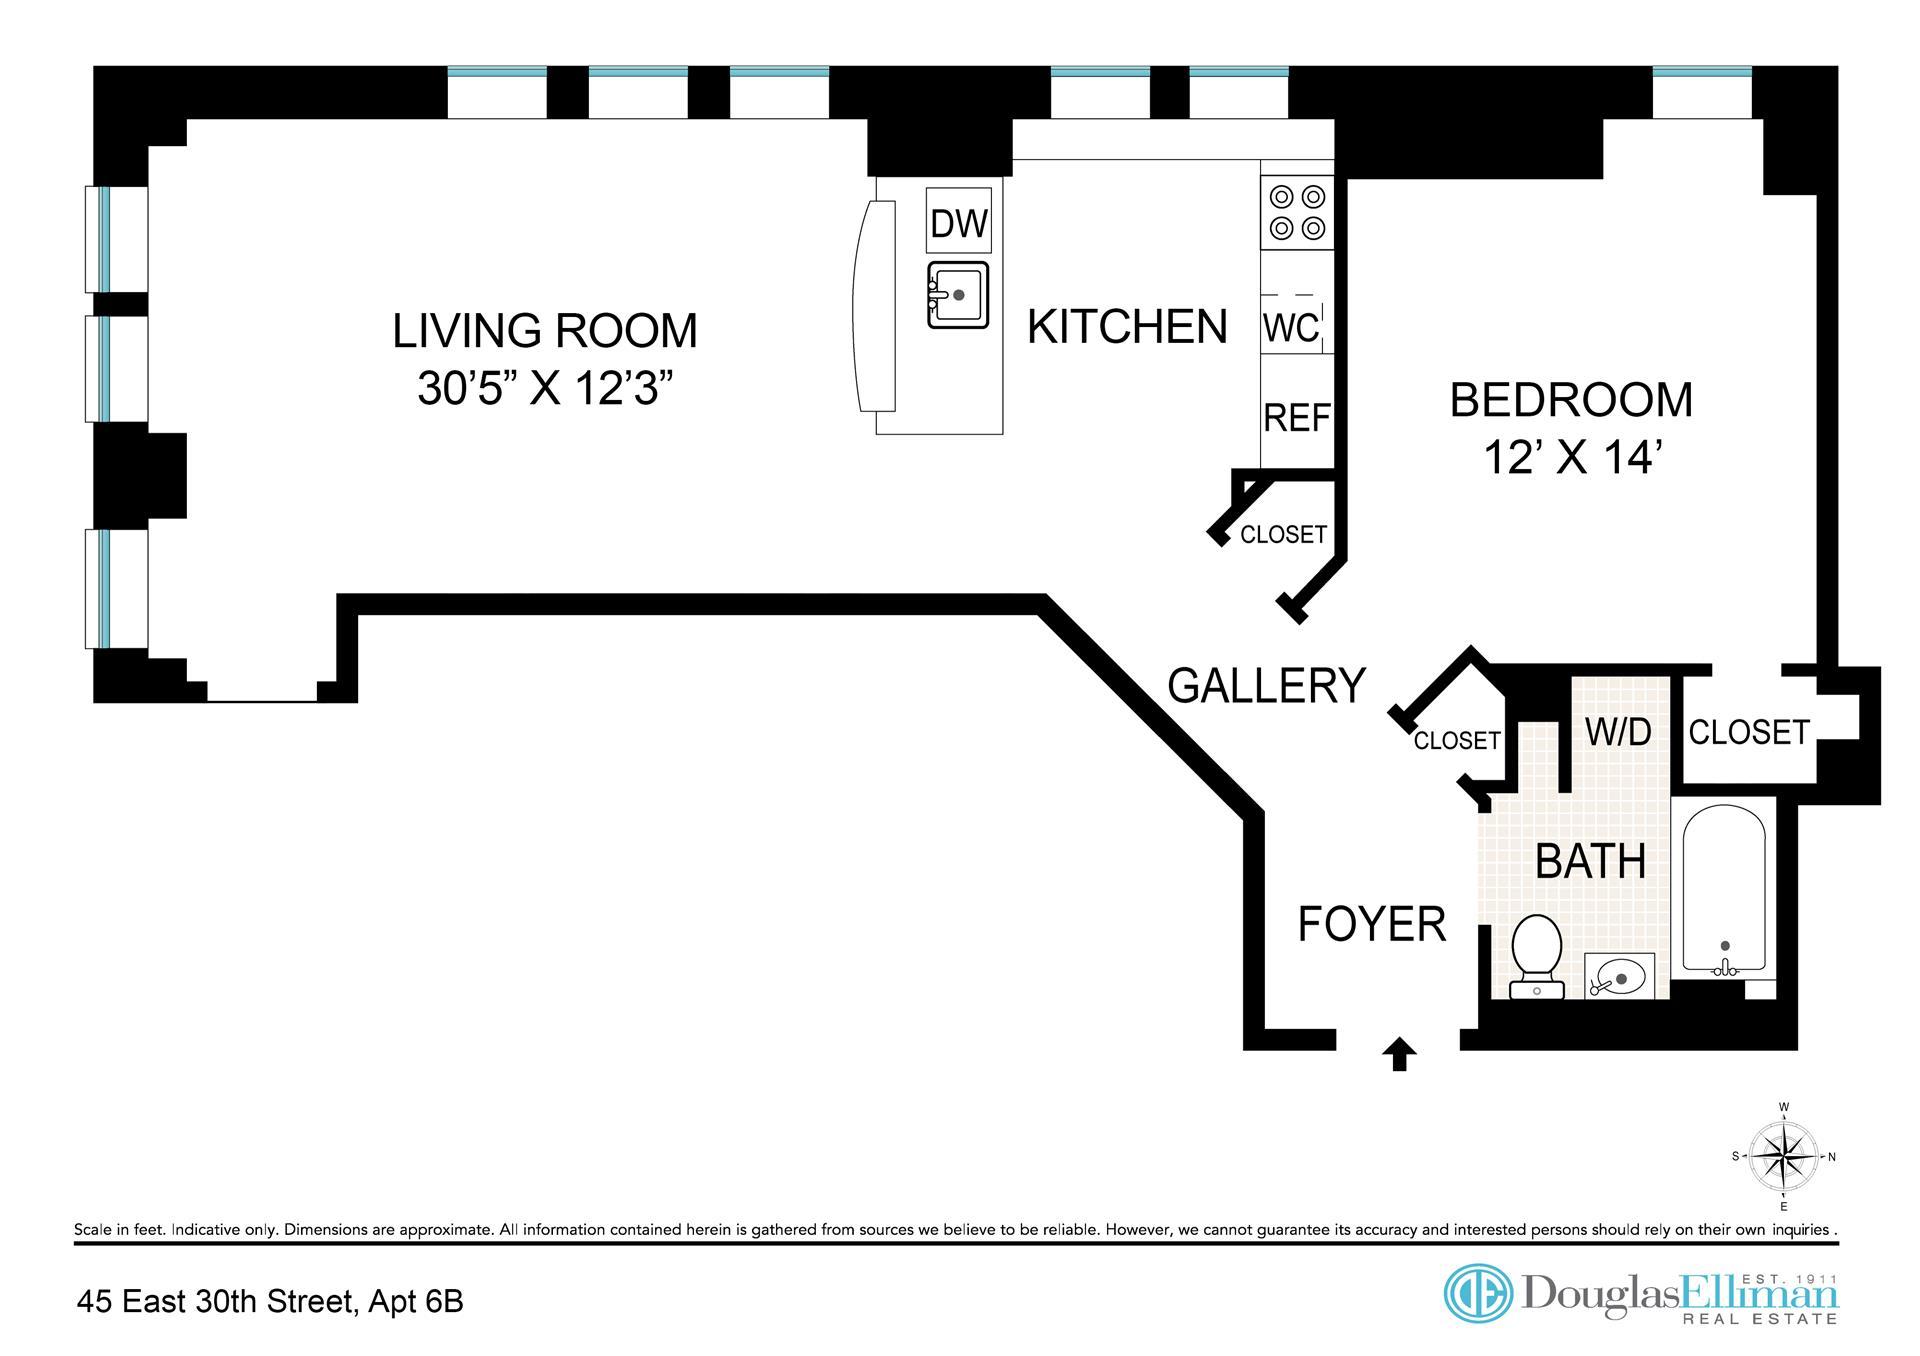 Floor plan of Park South Lofts, 45 East 30th St, 6B - Flatiron District, New York